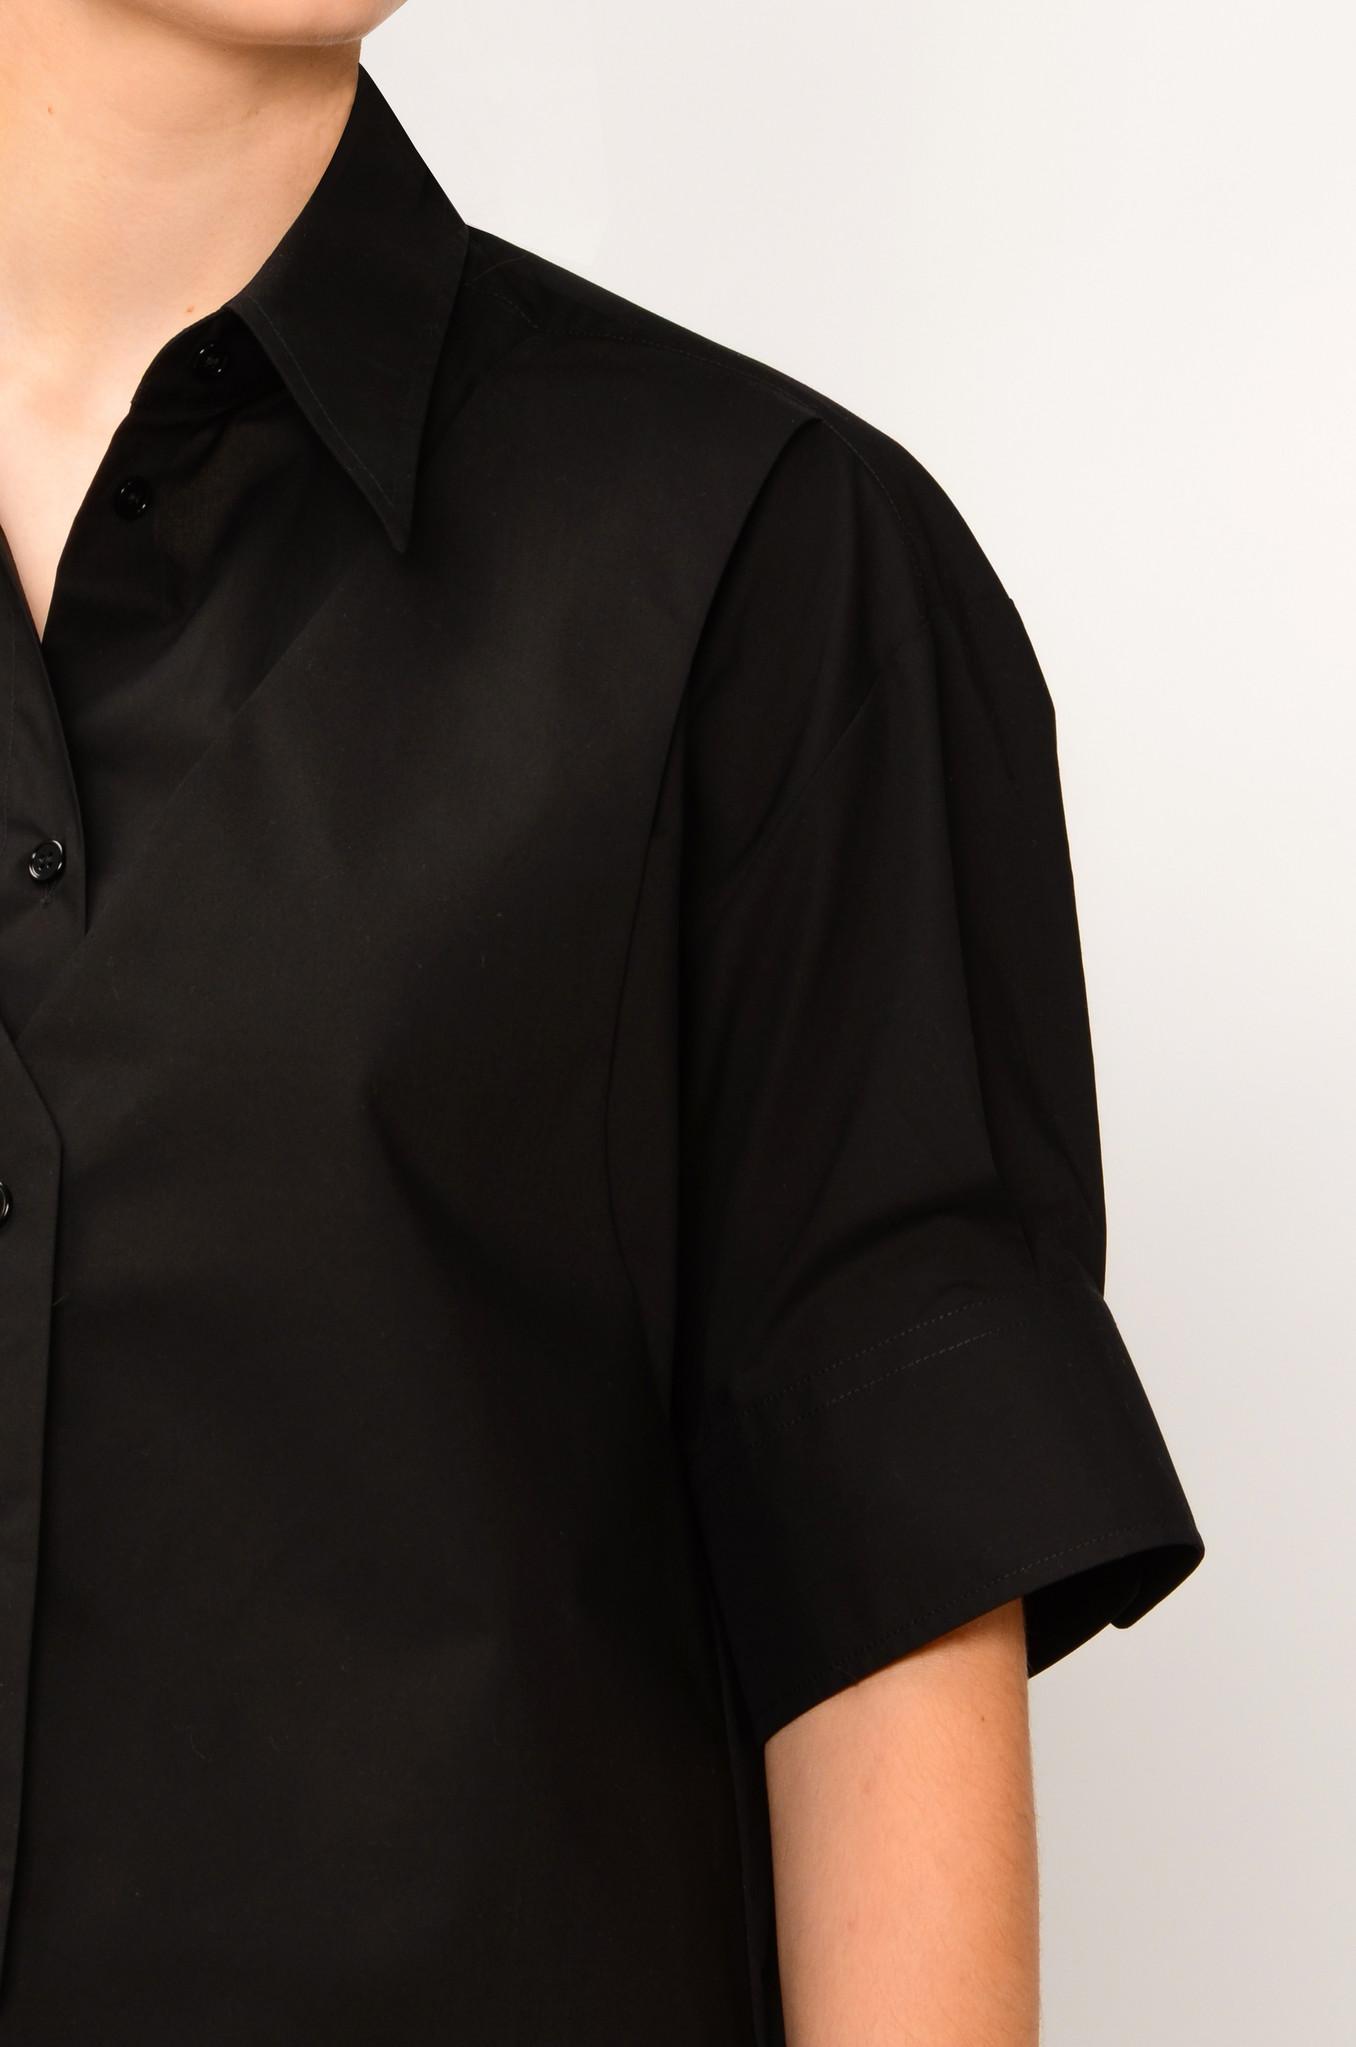 WAISTCOAT SHIRT DRESS IN BLACK-5